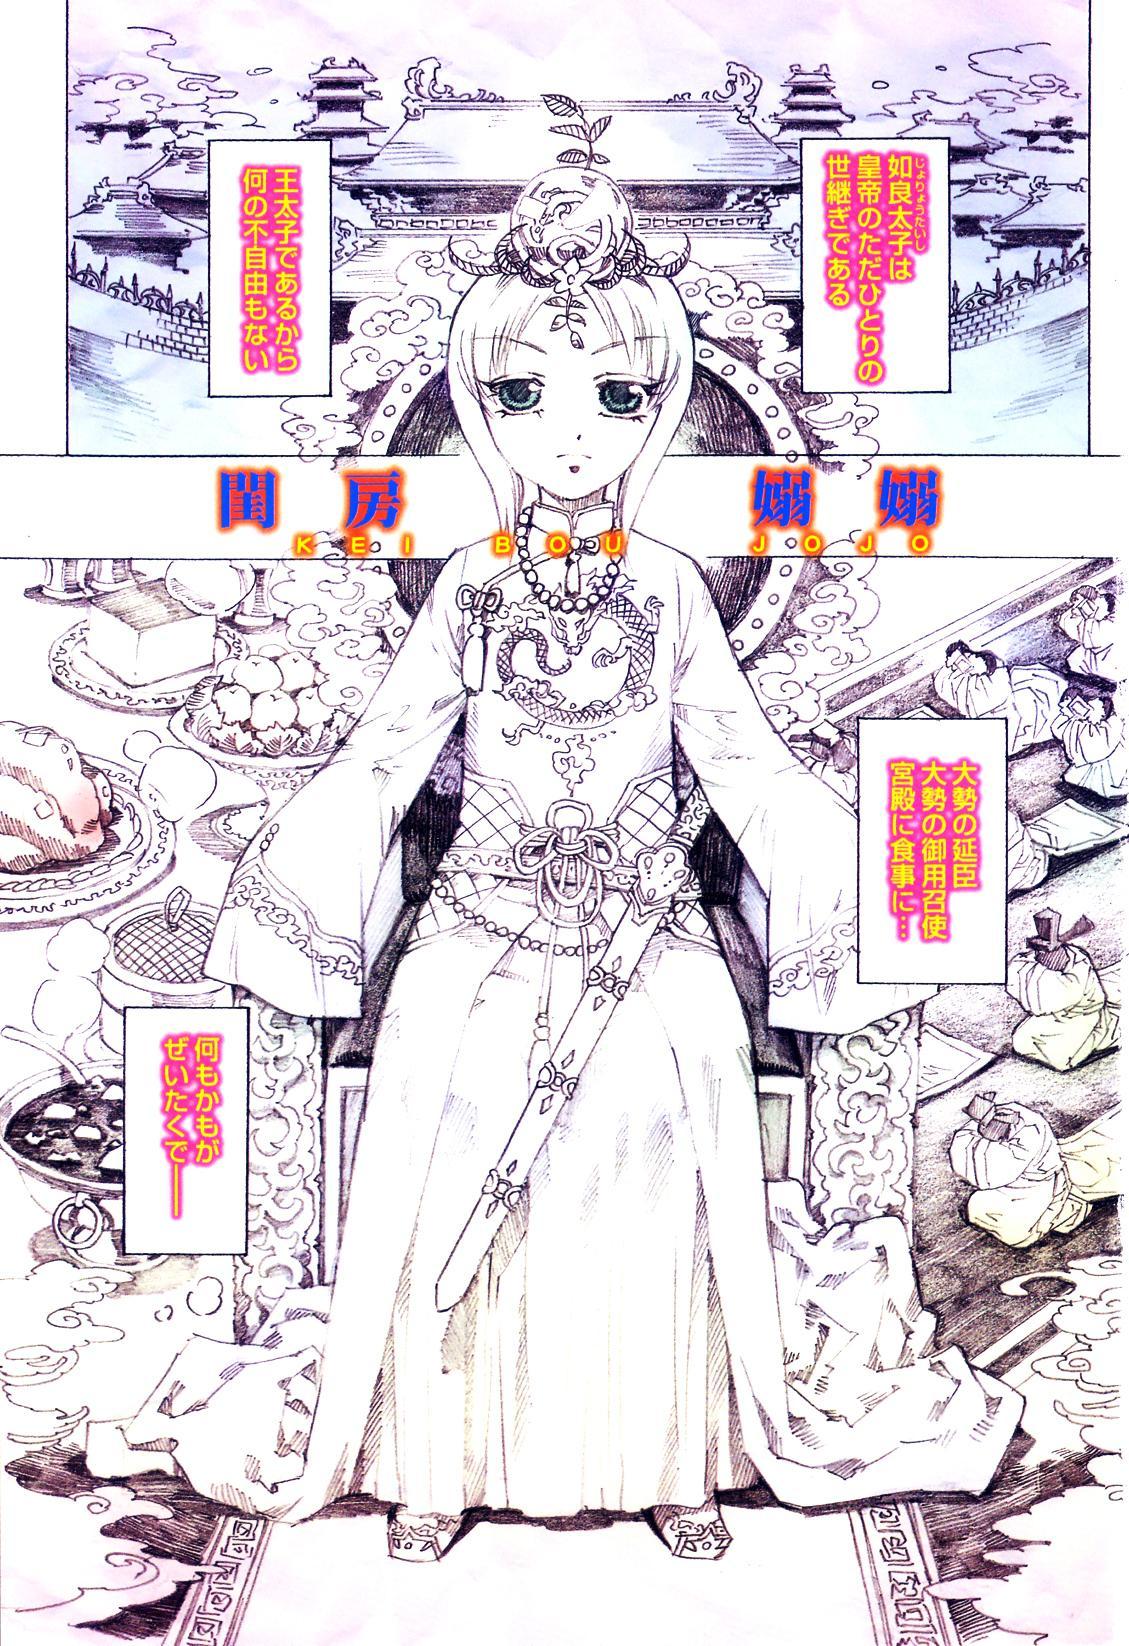 Yuni-Hapi 103